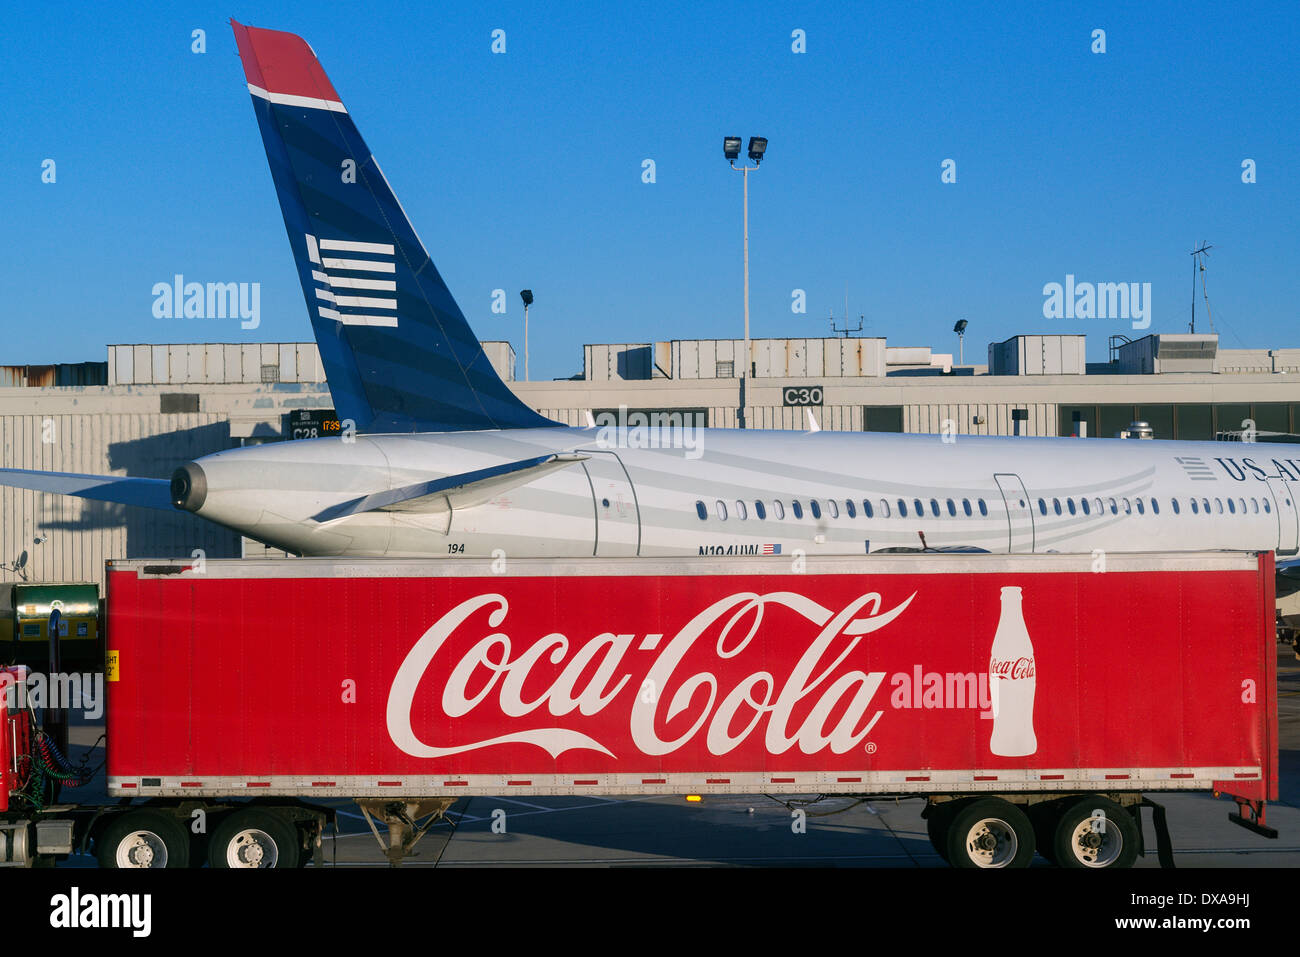 Coca Cola delivery truck at airport, Philadelphia, Pennsylvania, USA - Stock Image